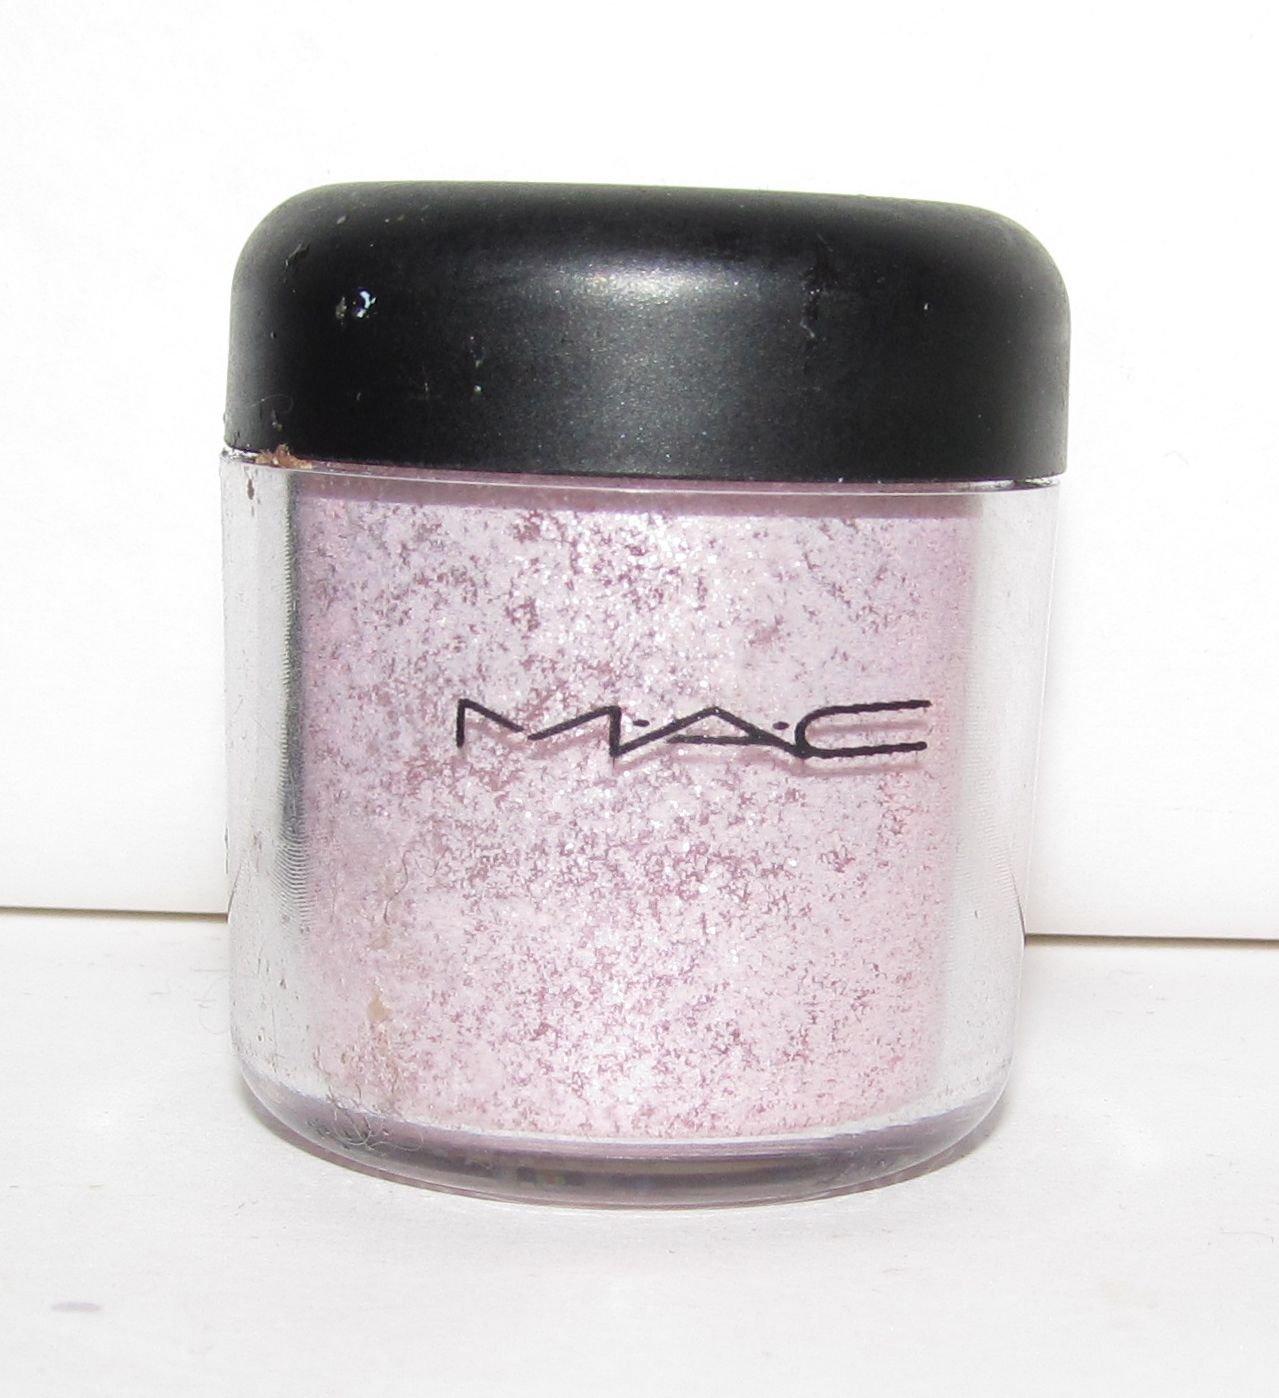 MAC - Helium 1/4 tsp Pigment Sample in Original Jar